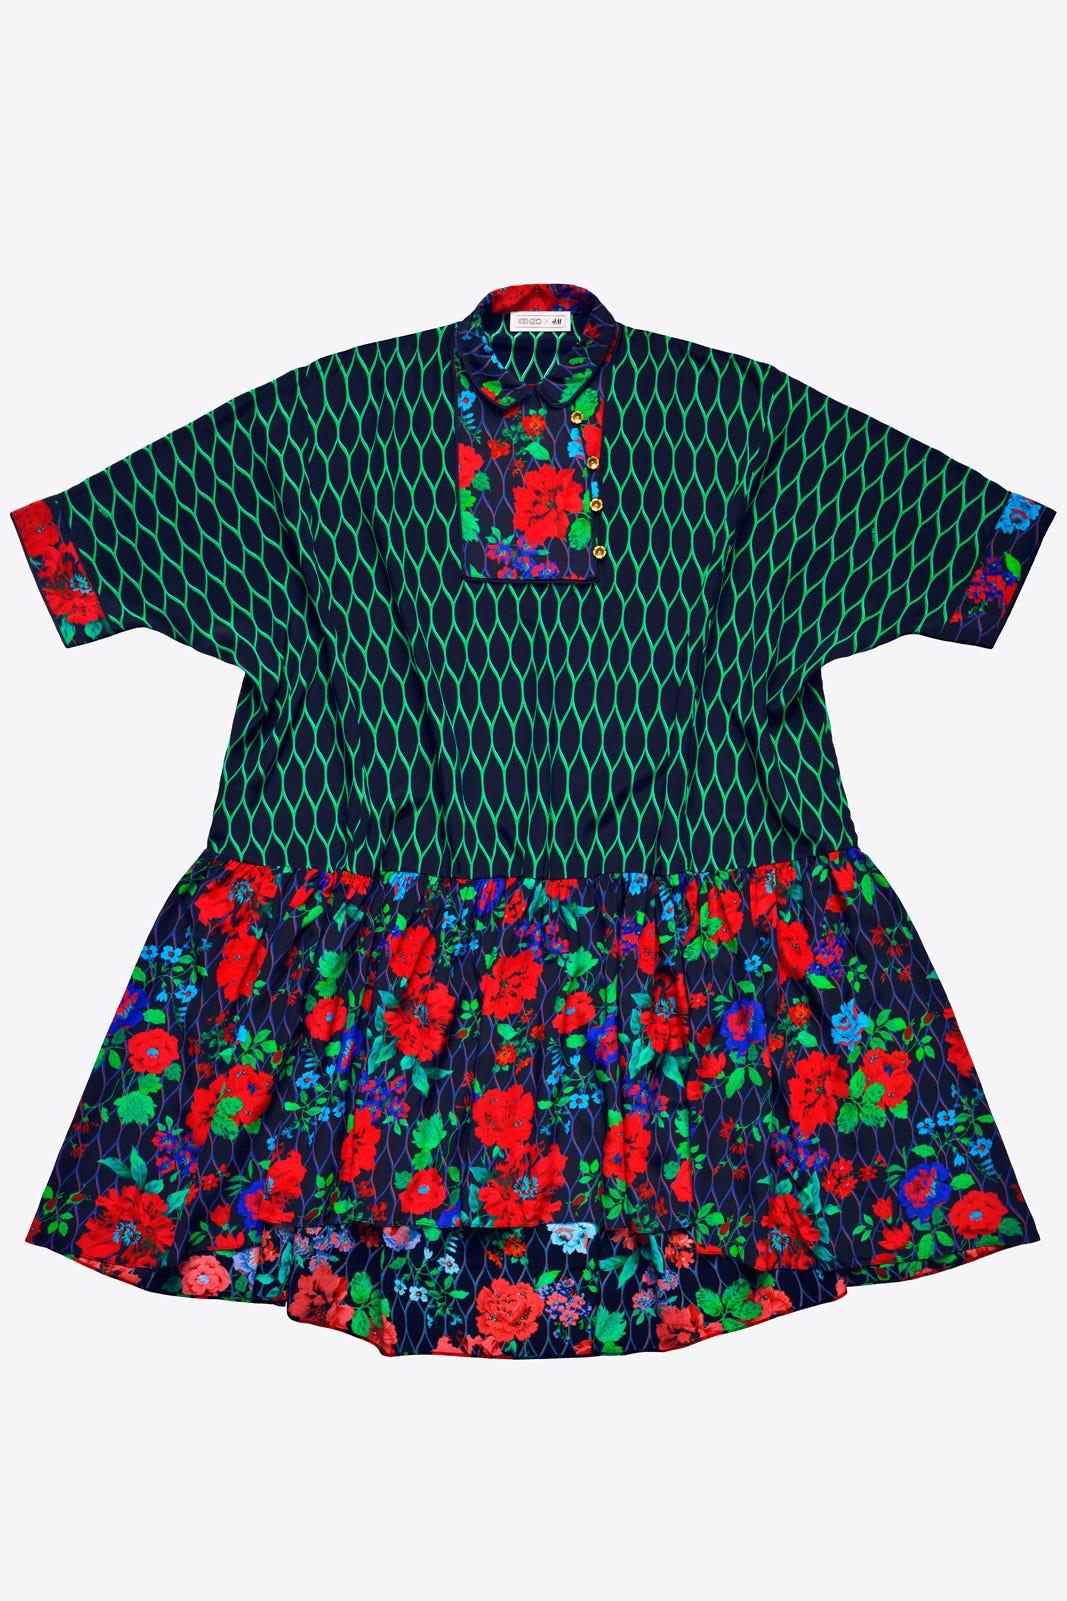 7fde1db1a9 HM Kenzo Full Clothing Collaboration Photos